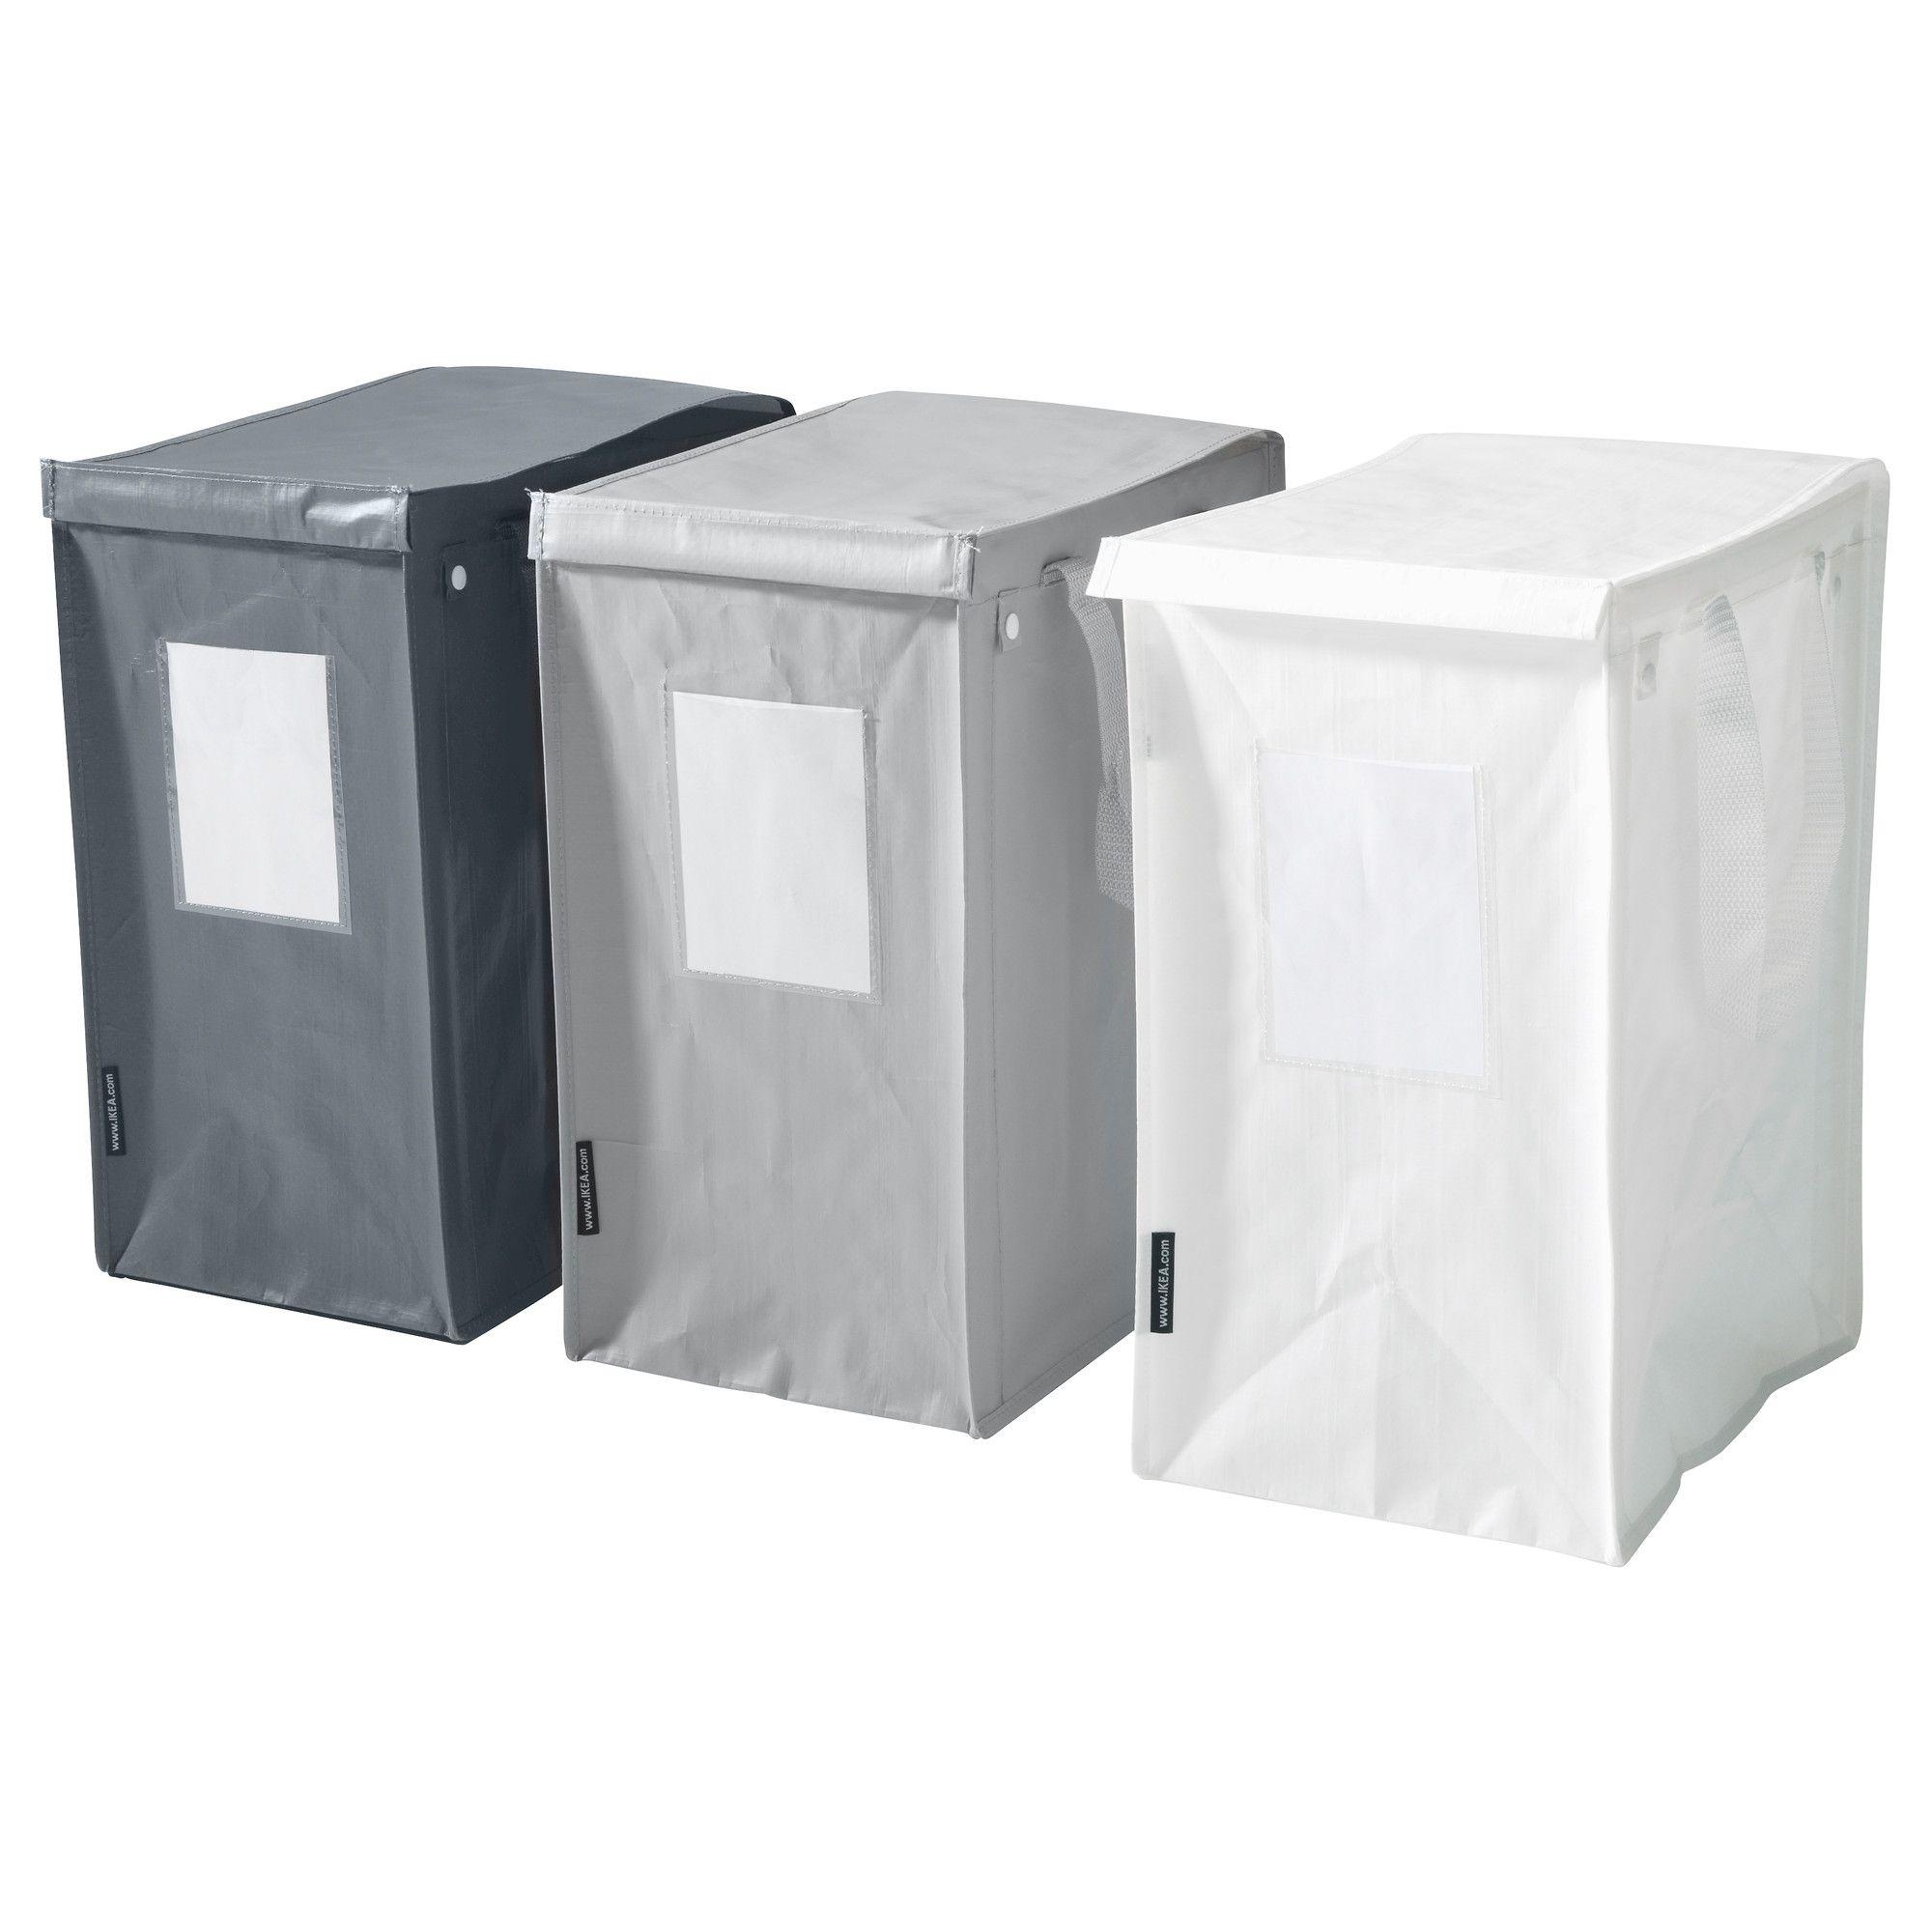 dimpa abfalltrennbeutel, weiß/dunkelgrau, hellgrau | recycling, Hause deko